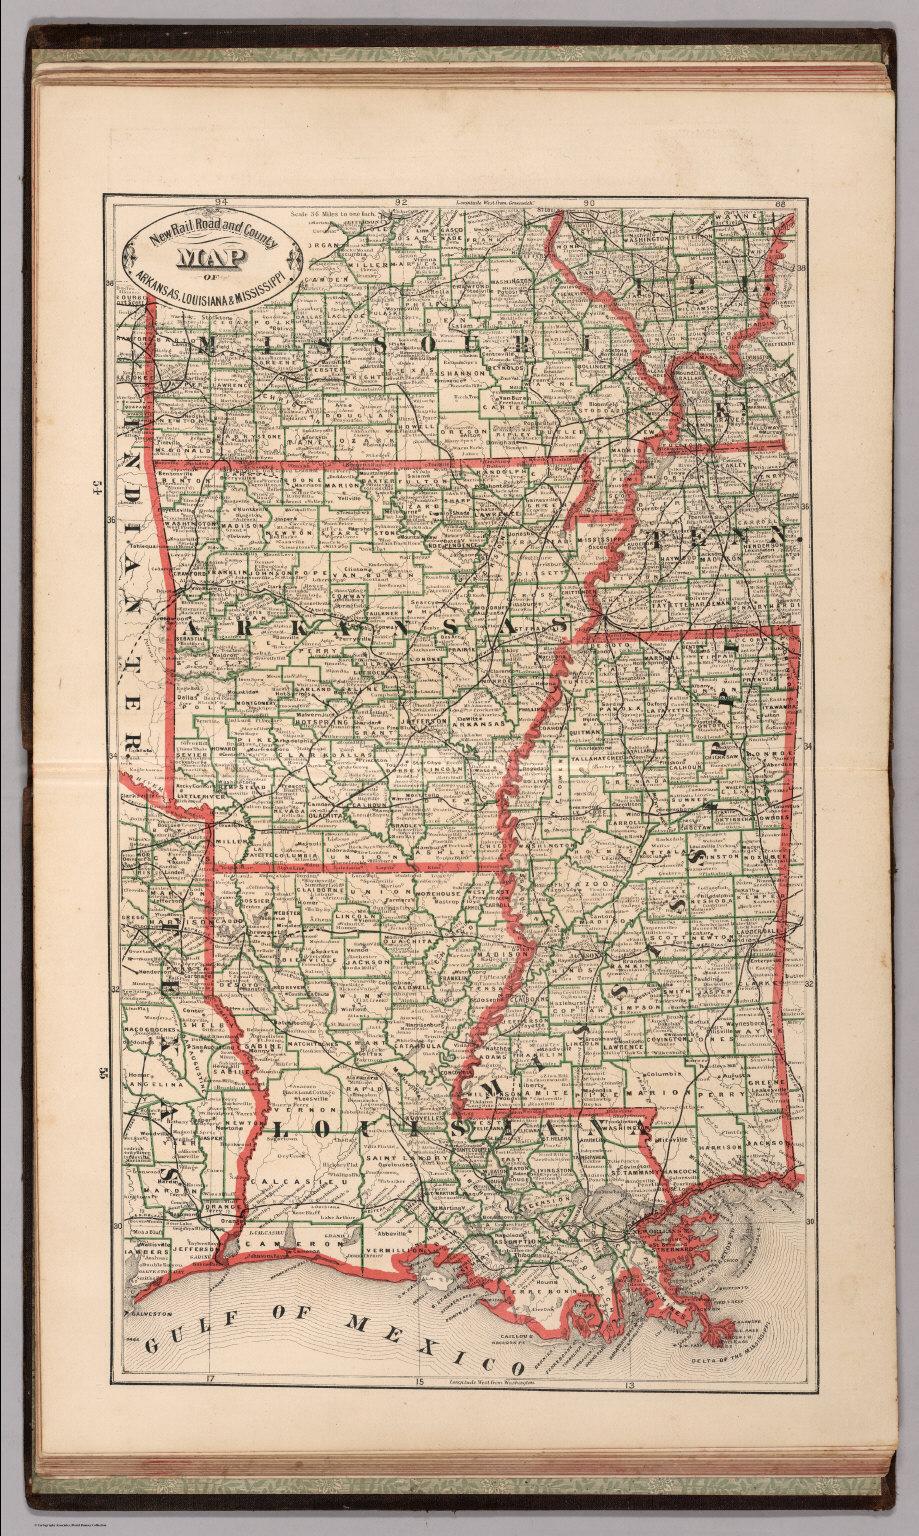 Arkansas And Louisiana Map.New Rail Road And County Map Of Arkansas Louisiana And Mississippi